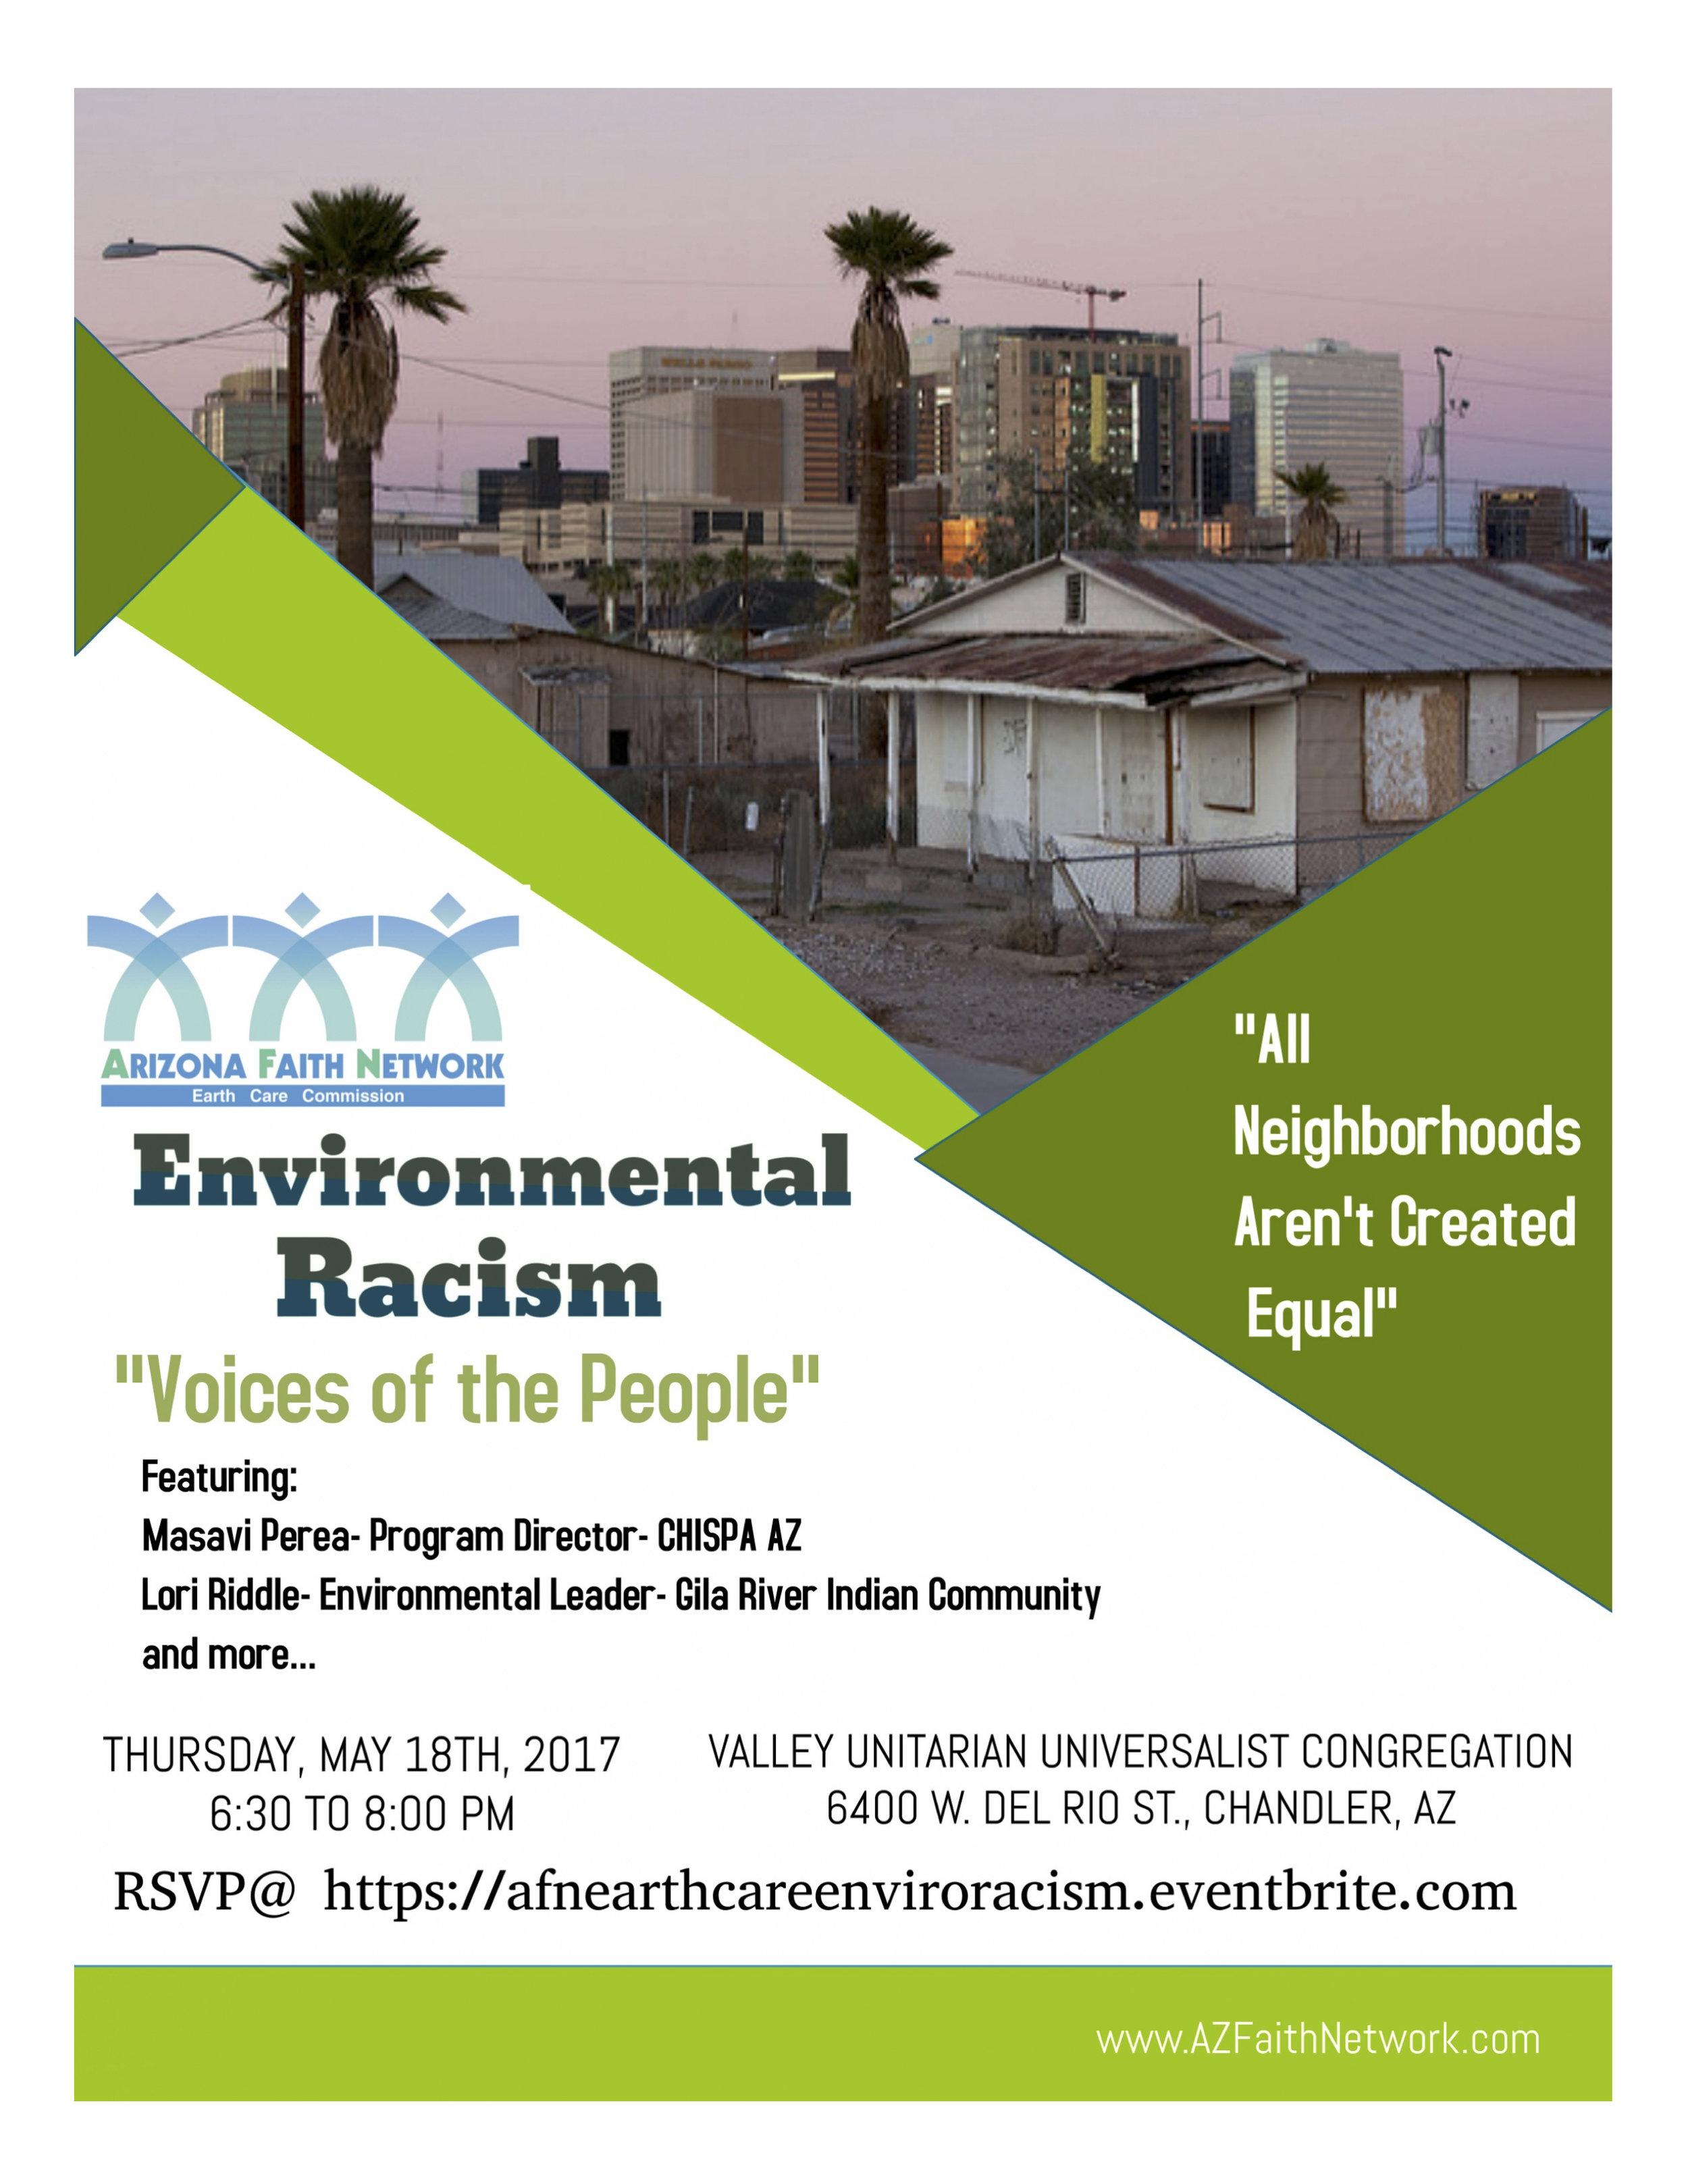 2017.05.18 EnviroRacism Event Flyer.jpg